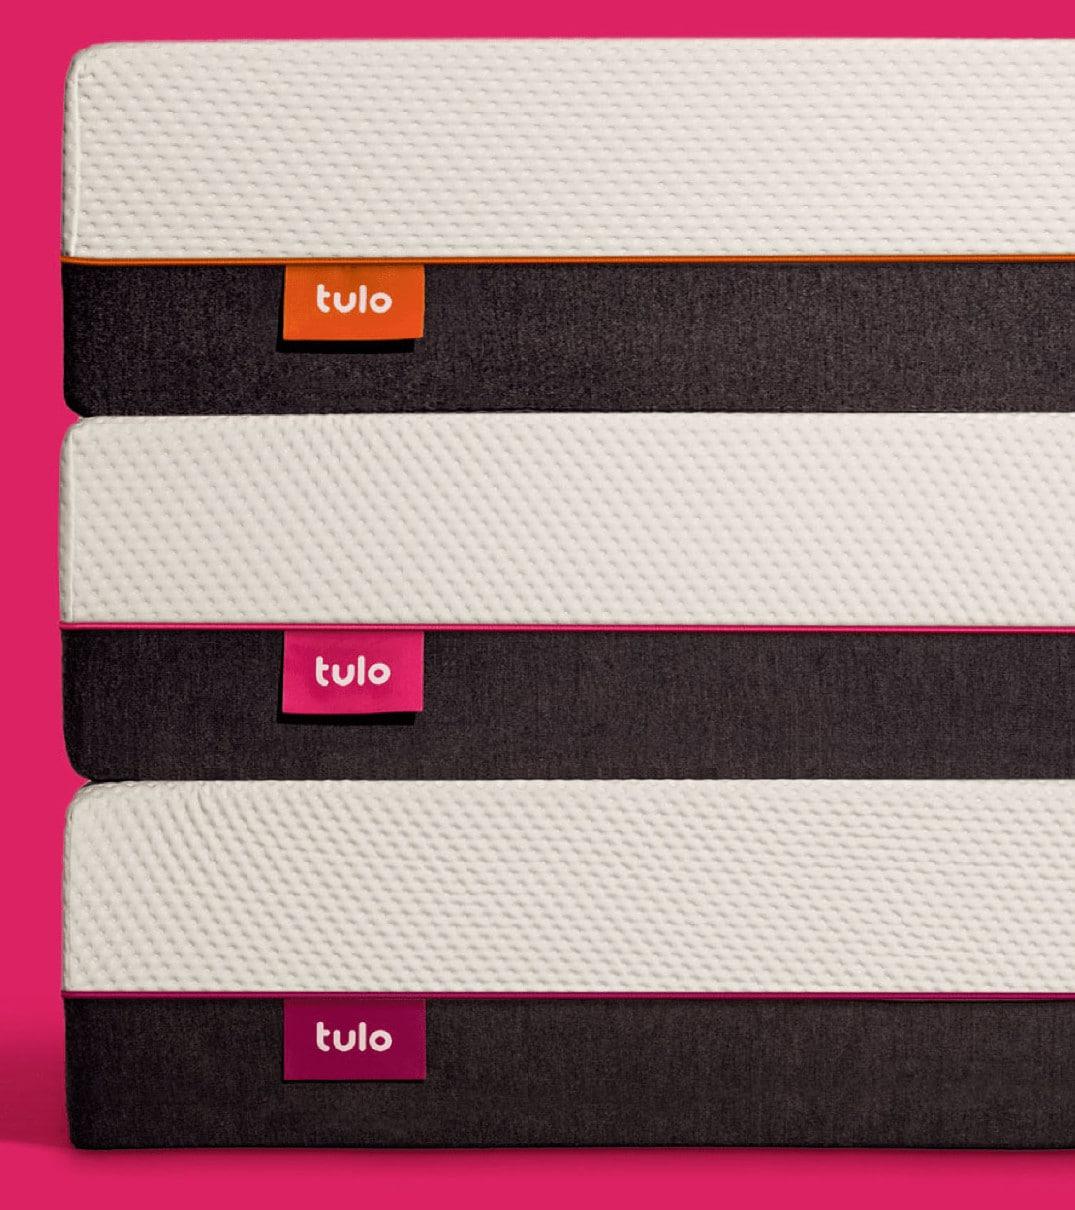 tulo stacked mattress pink